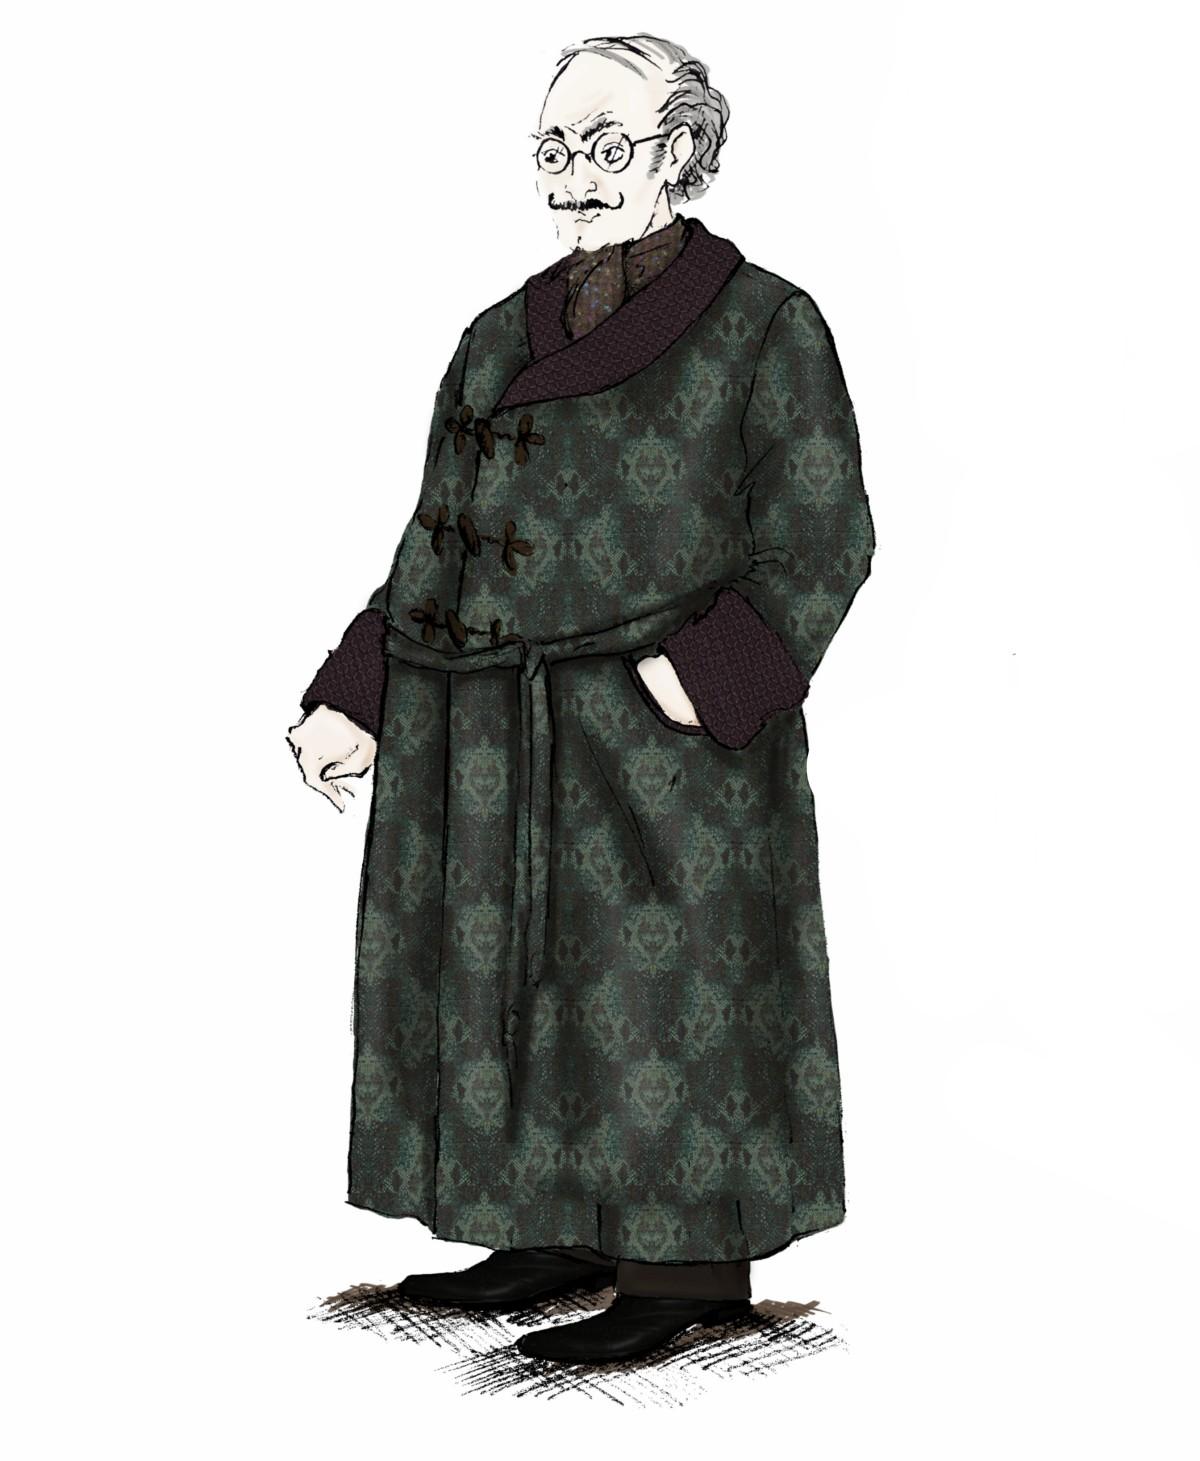 Hogwarts Houses Slytherin